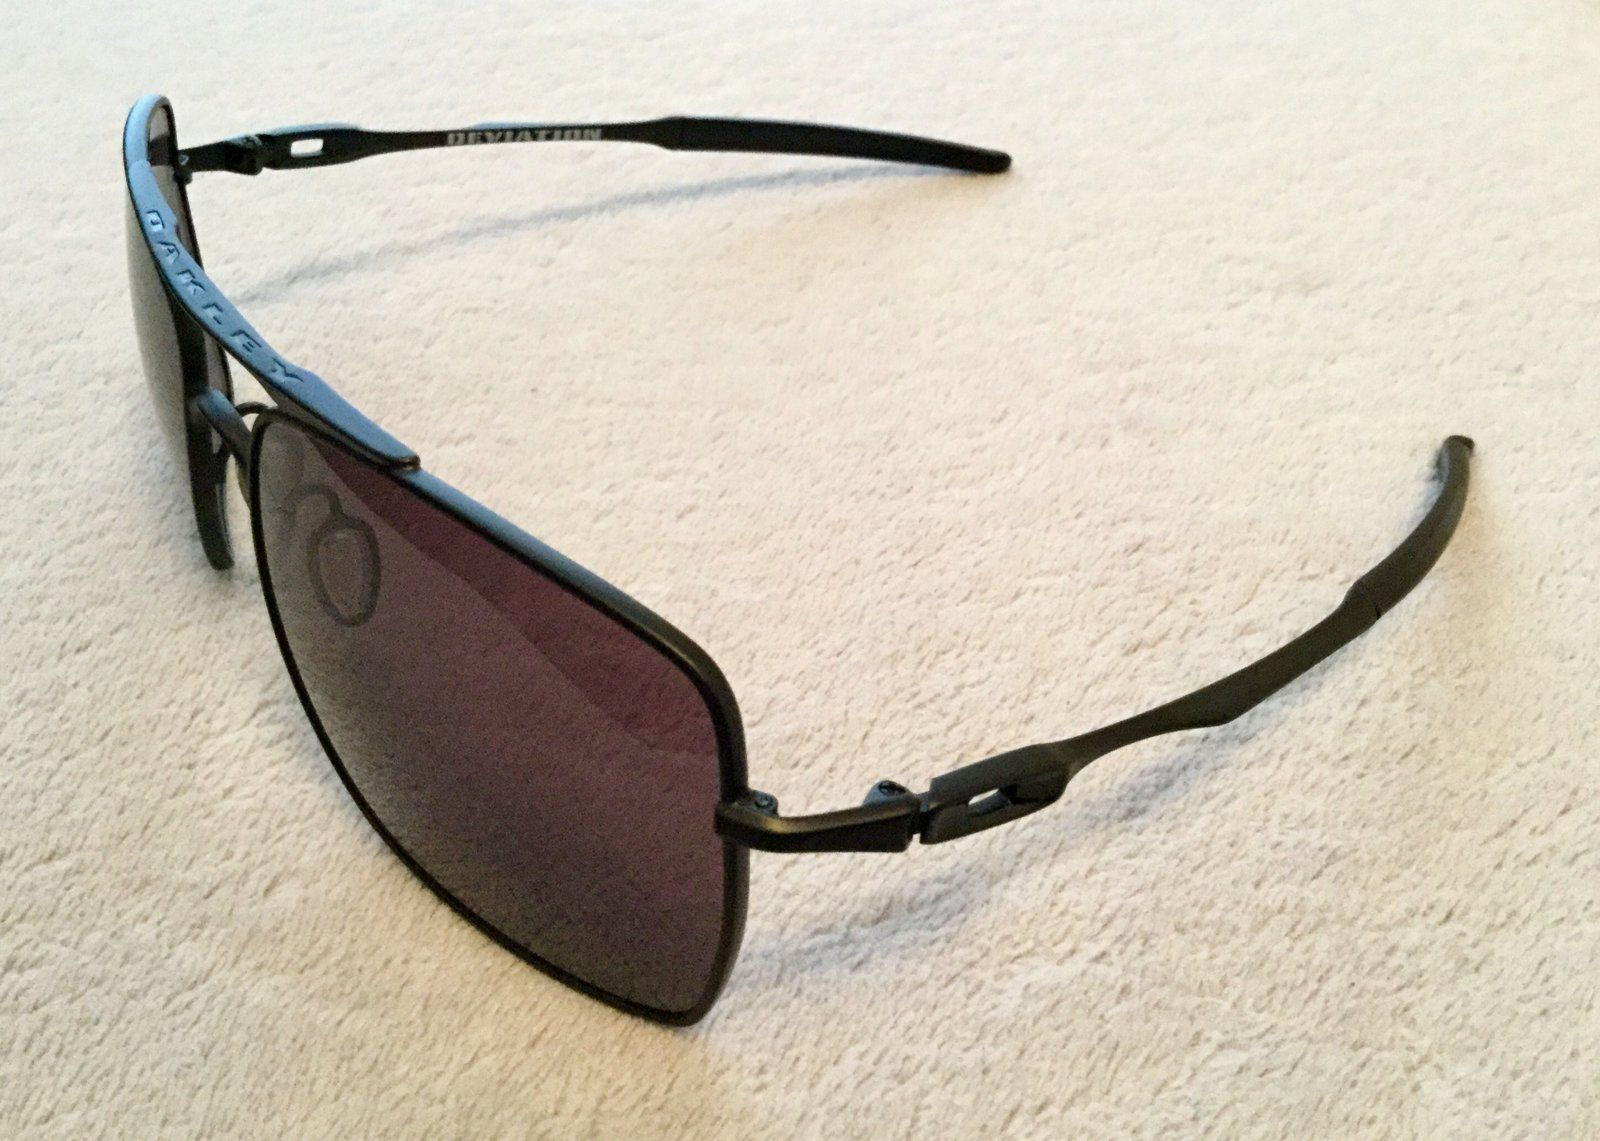 22bf513e51 Oakley Deviation Sunglasses (New) - F248A1B0-D3D7-4DF4-8CCB-774C9BBCEFB3